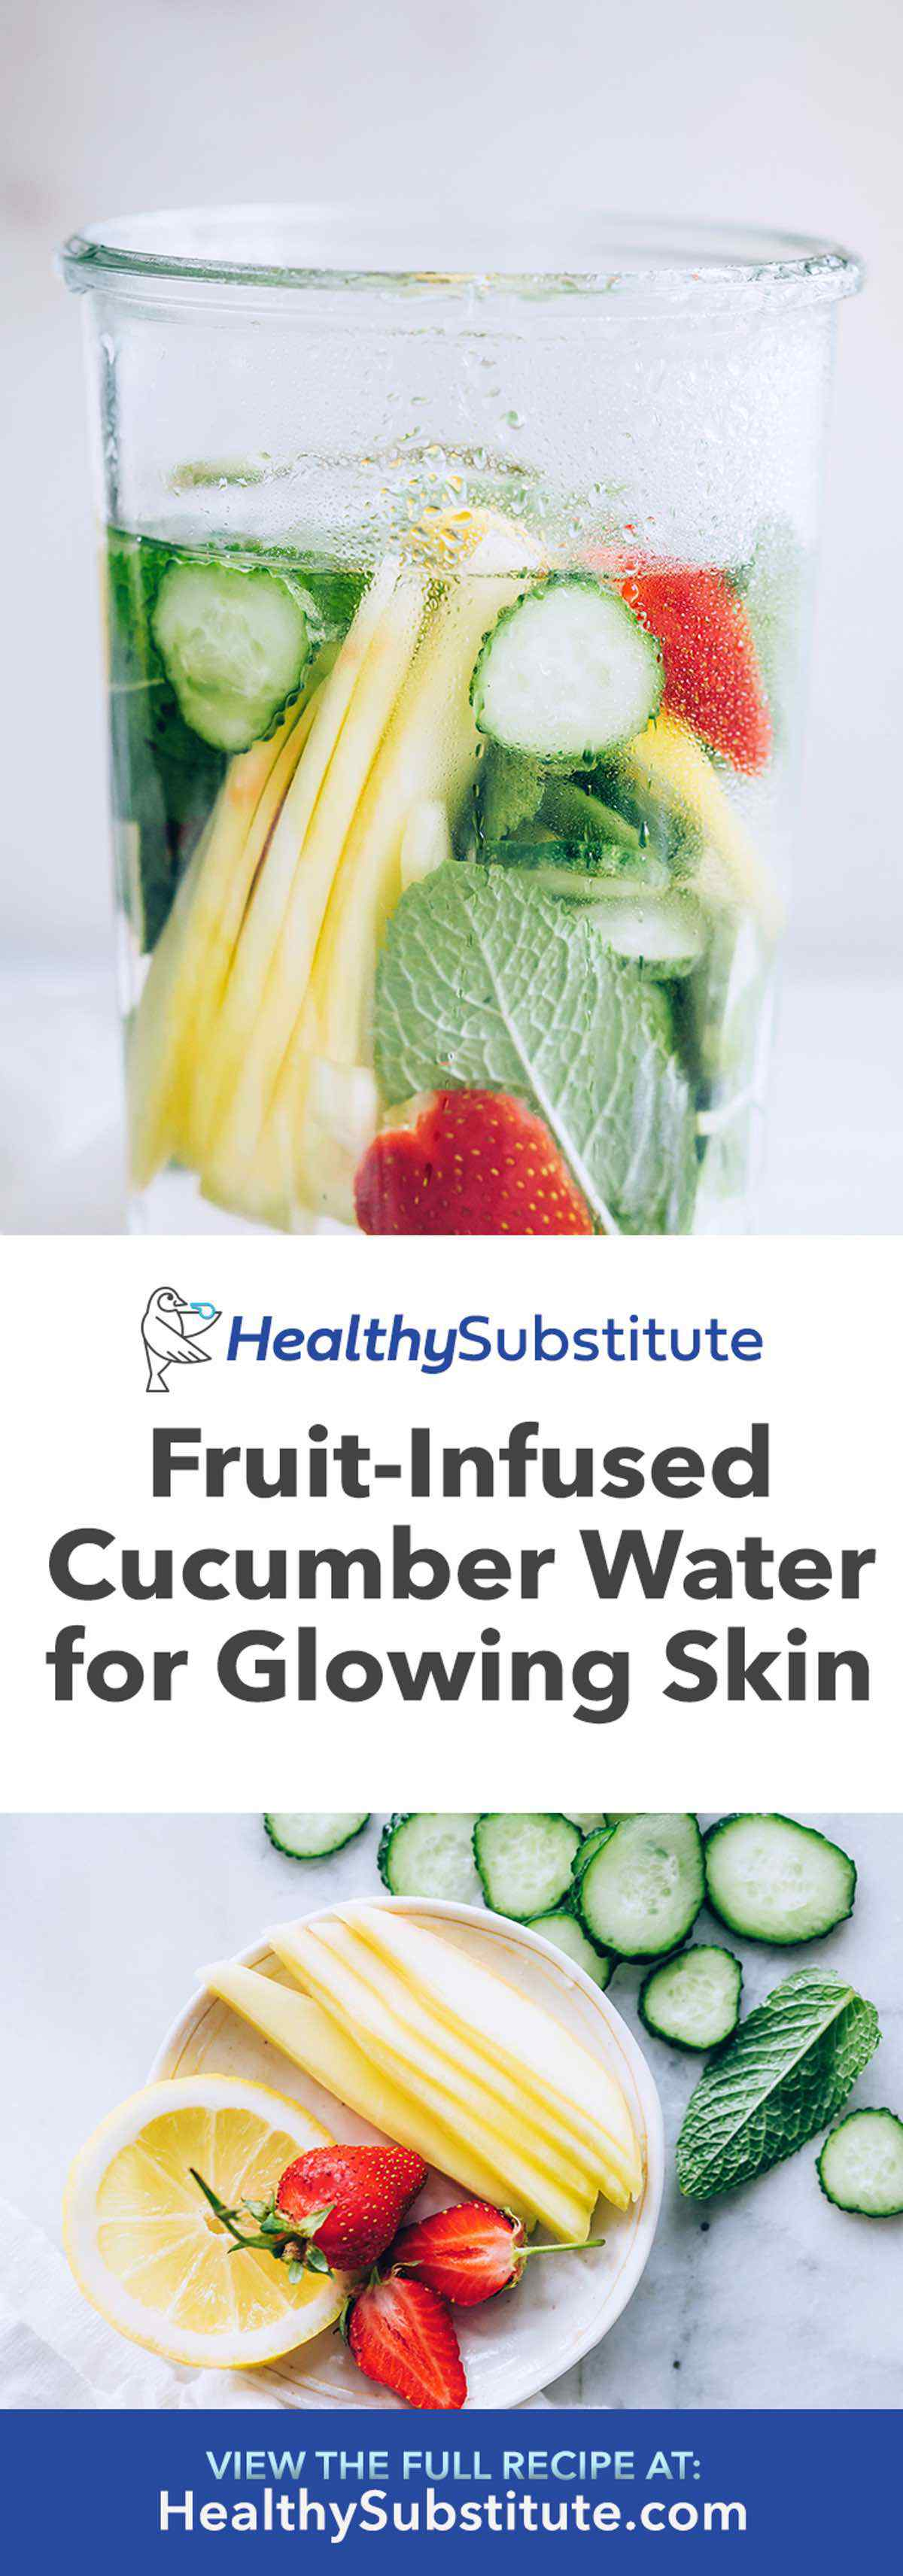 Fruit-Infused Cucumber Water Recipe